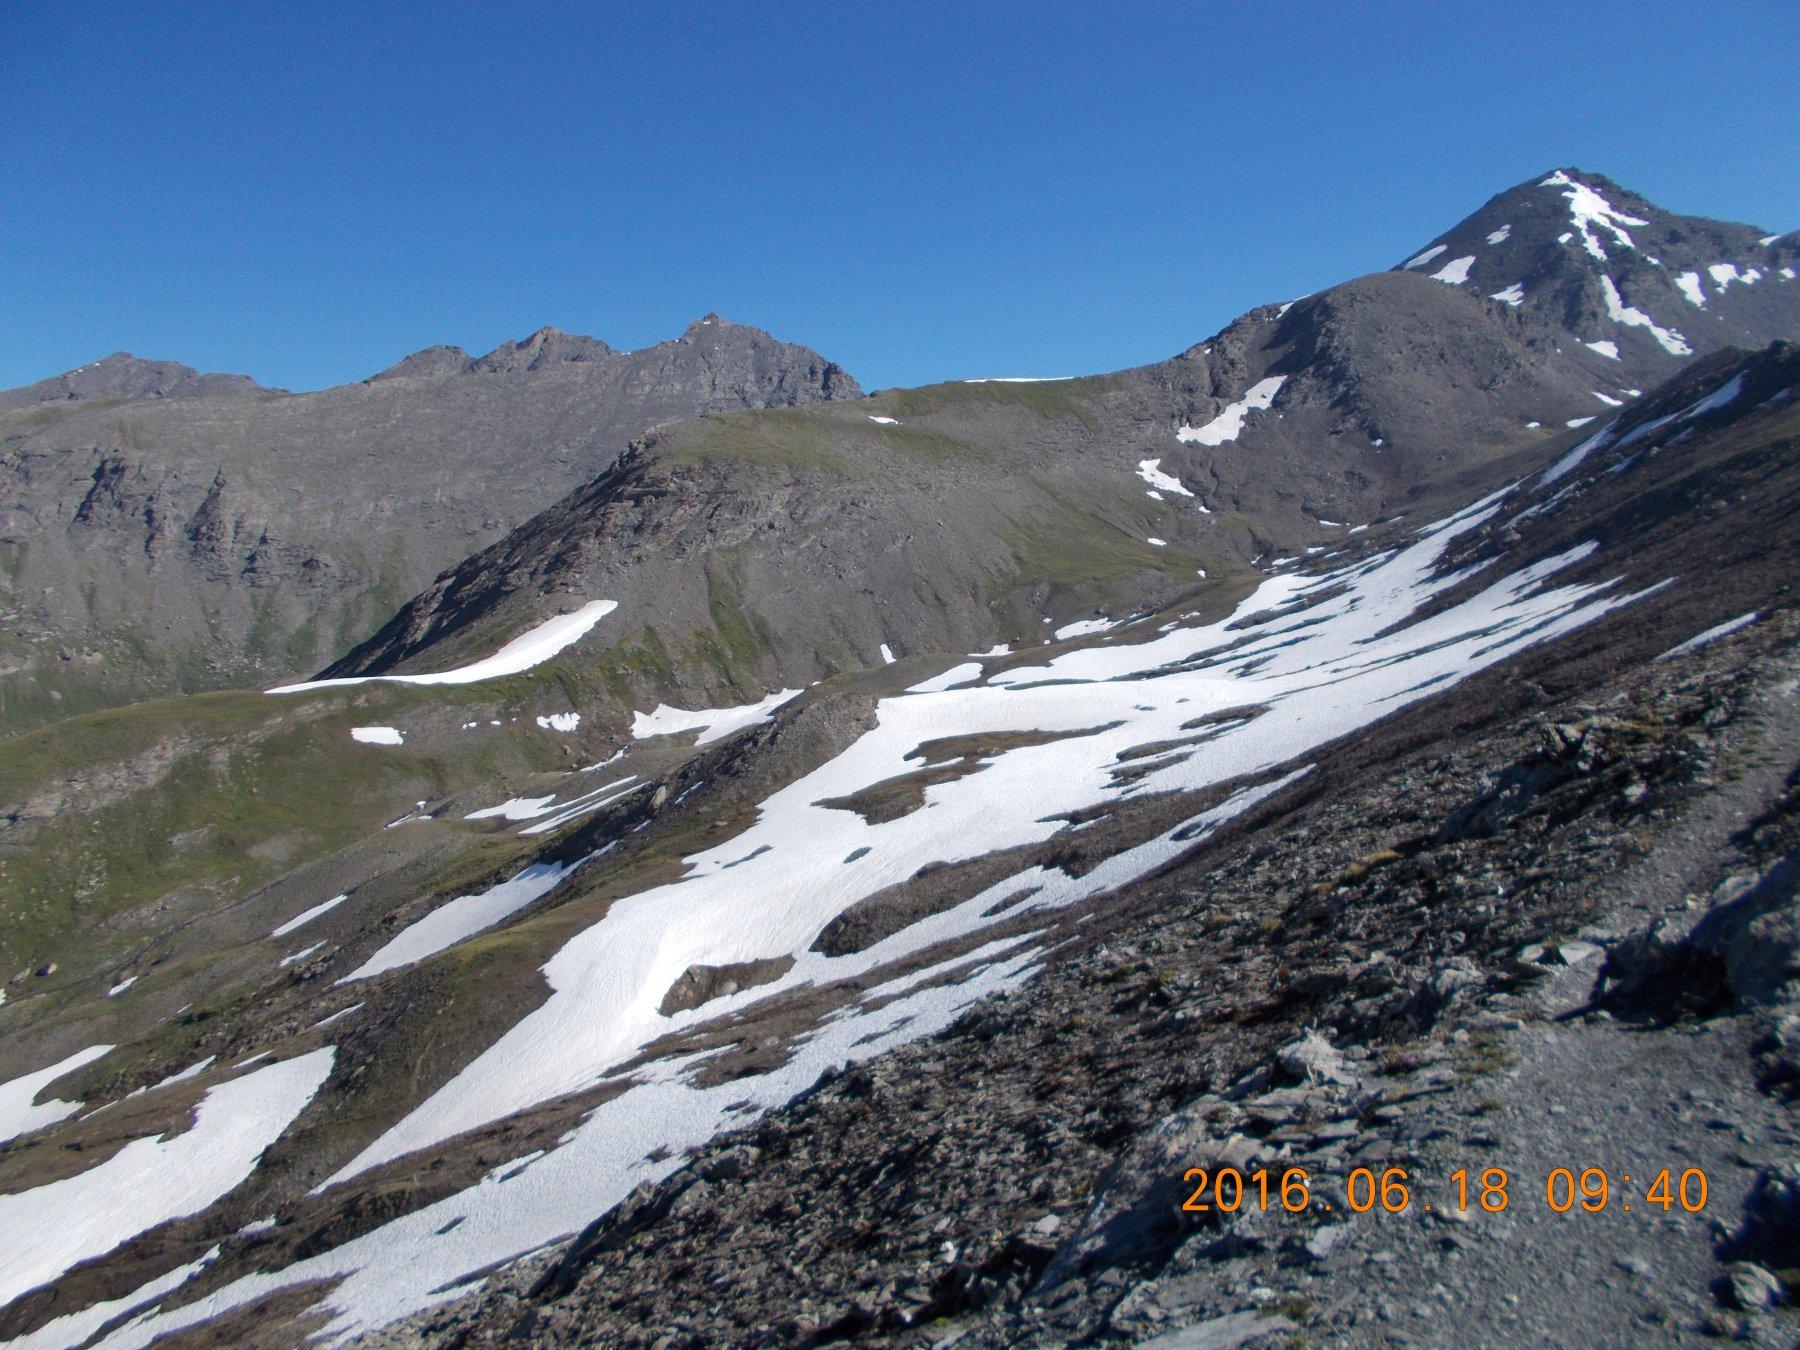 Sulla destra la Punta Ramiere 3303m.